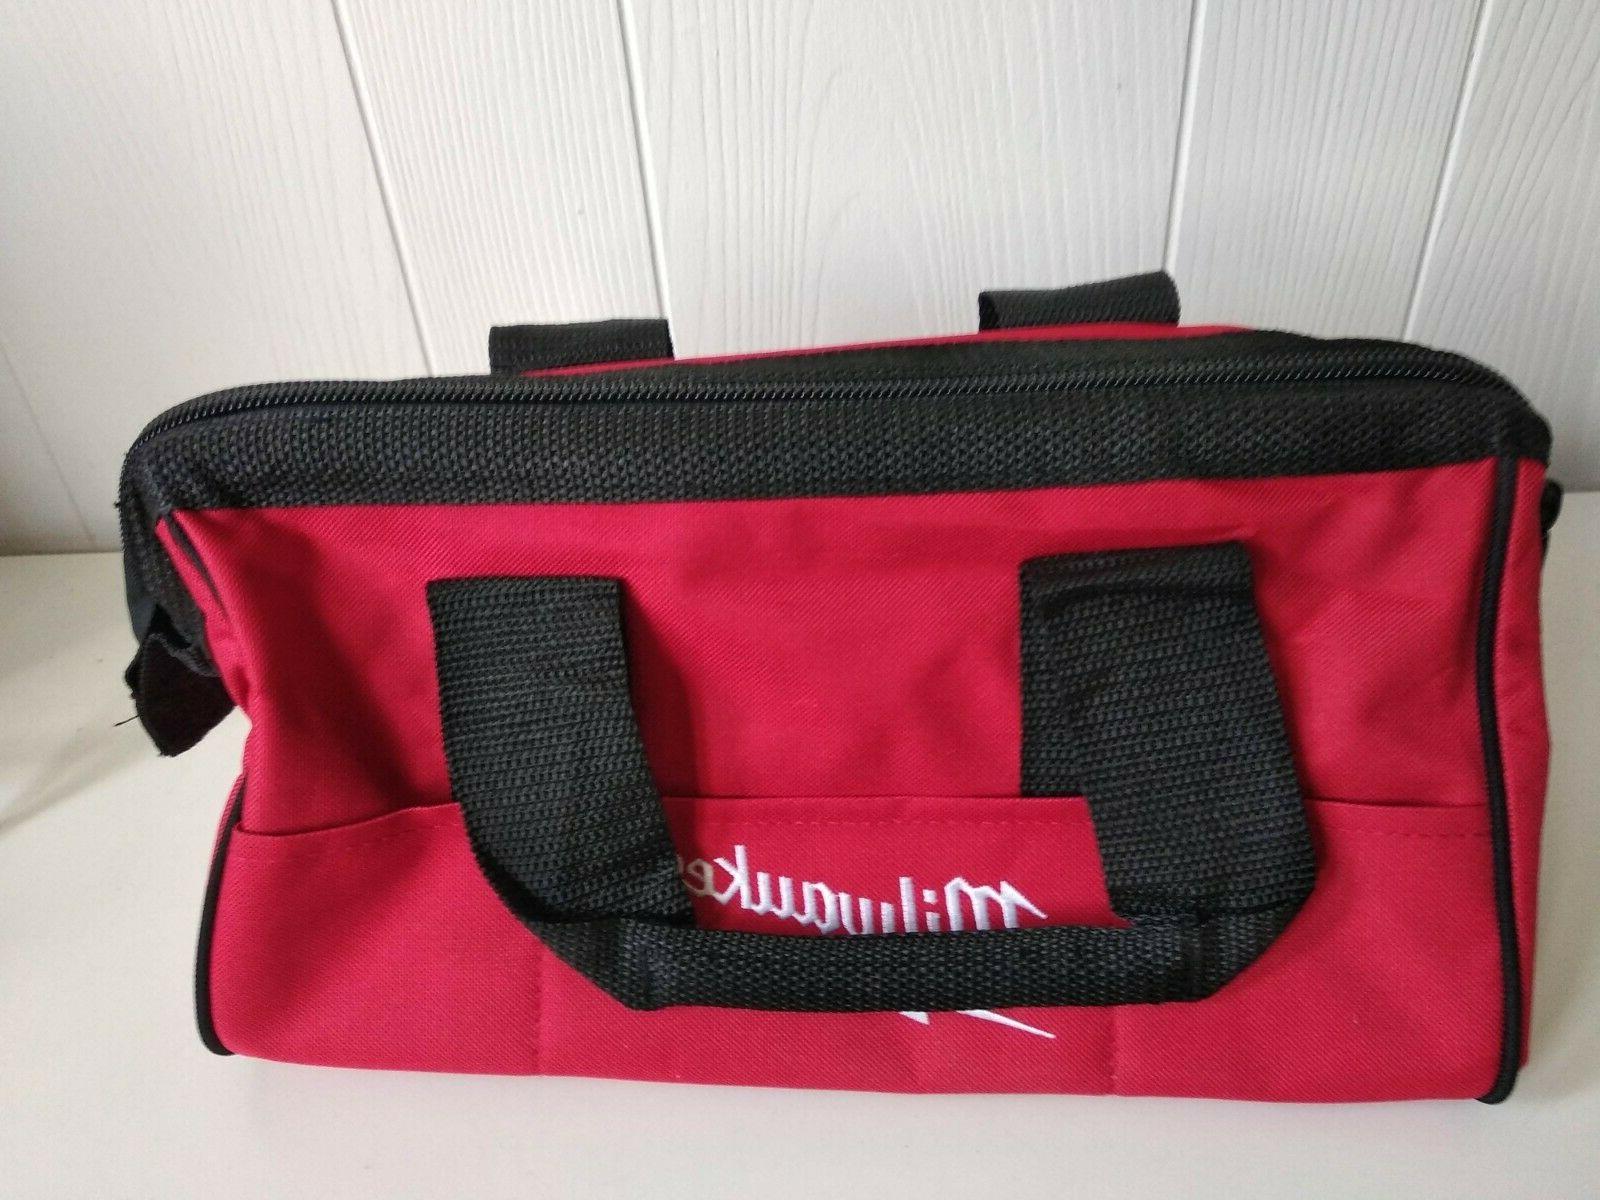 new milwaukee tool bag 13 x 6